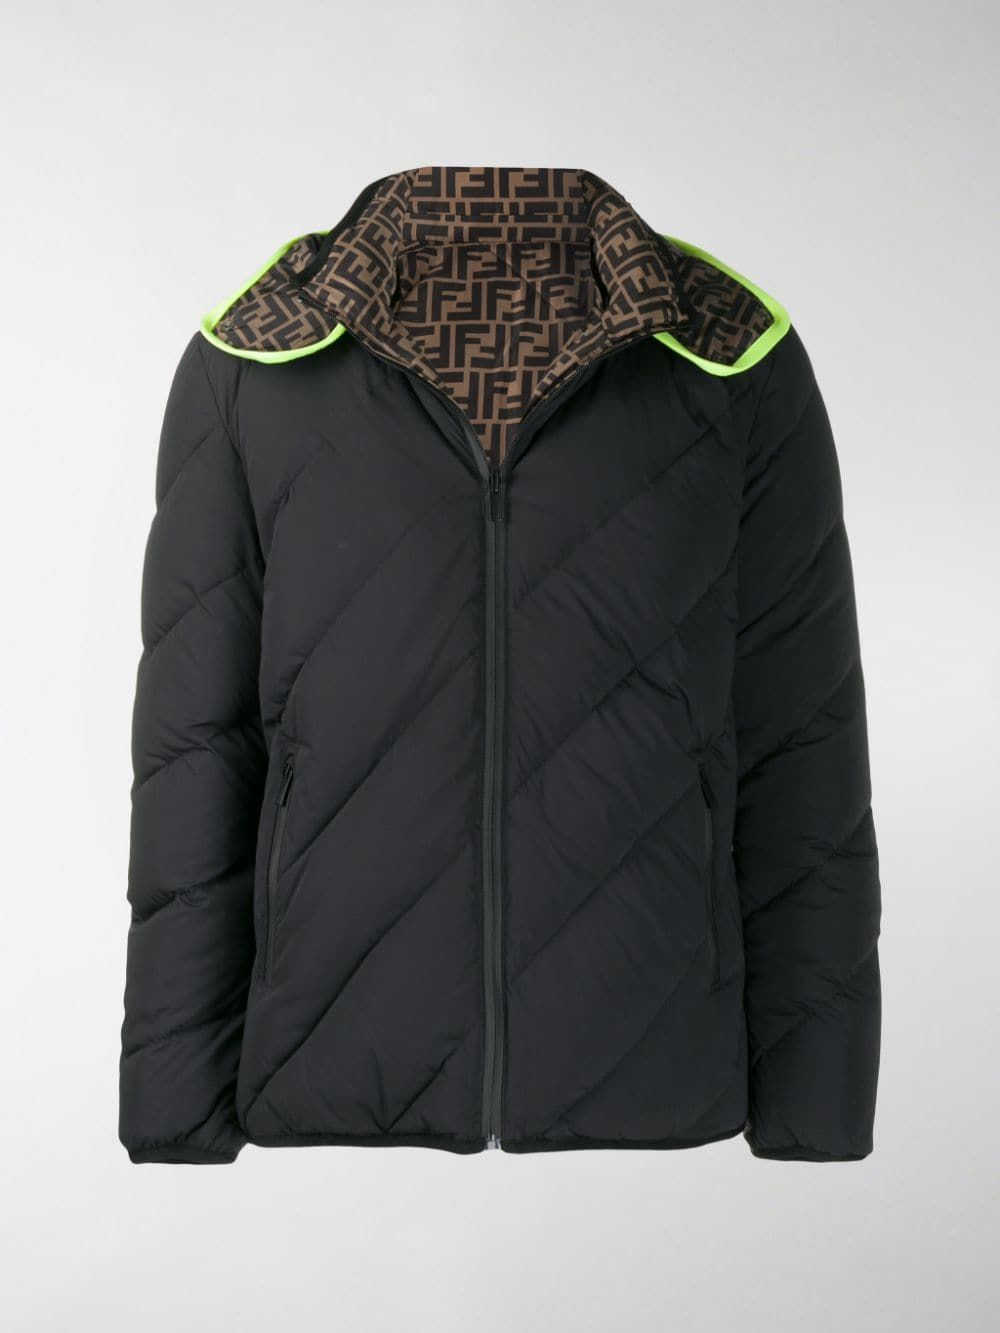 Fendi Men S Reversible Ff Quilted Down Puffer Jacket In Black Modesens Jackets Fendi Clothing Fendi [ 1333 x 1000 Pixel ]